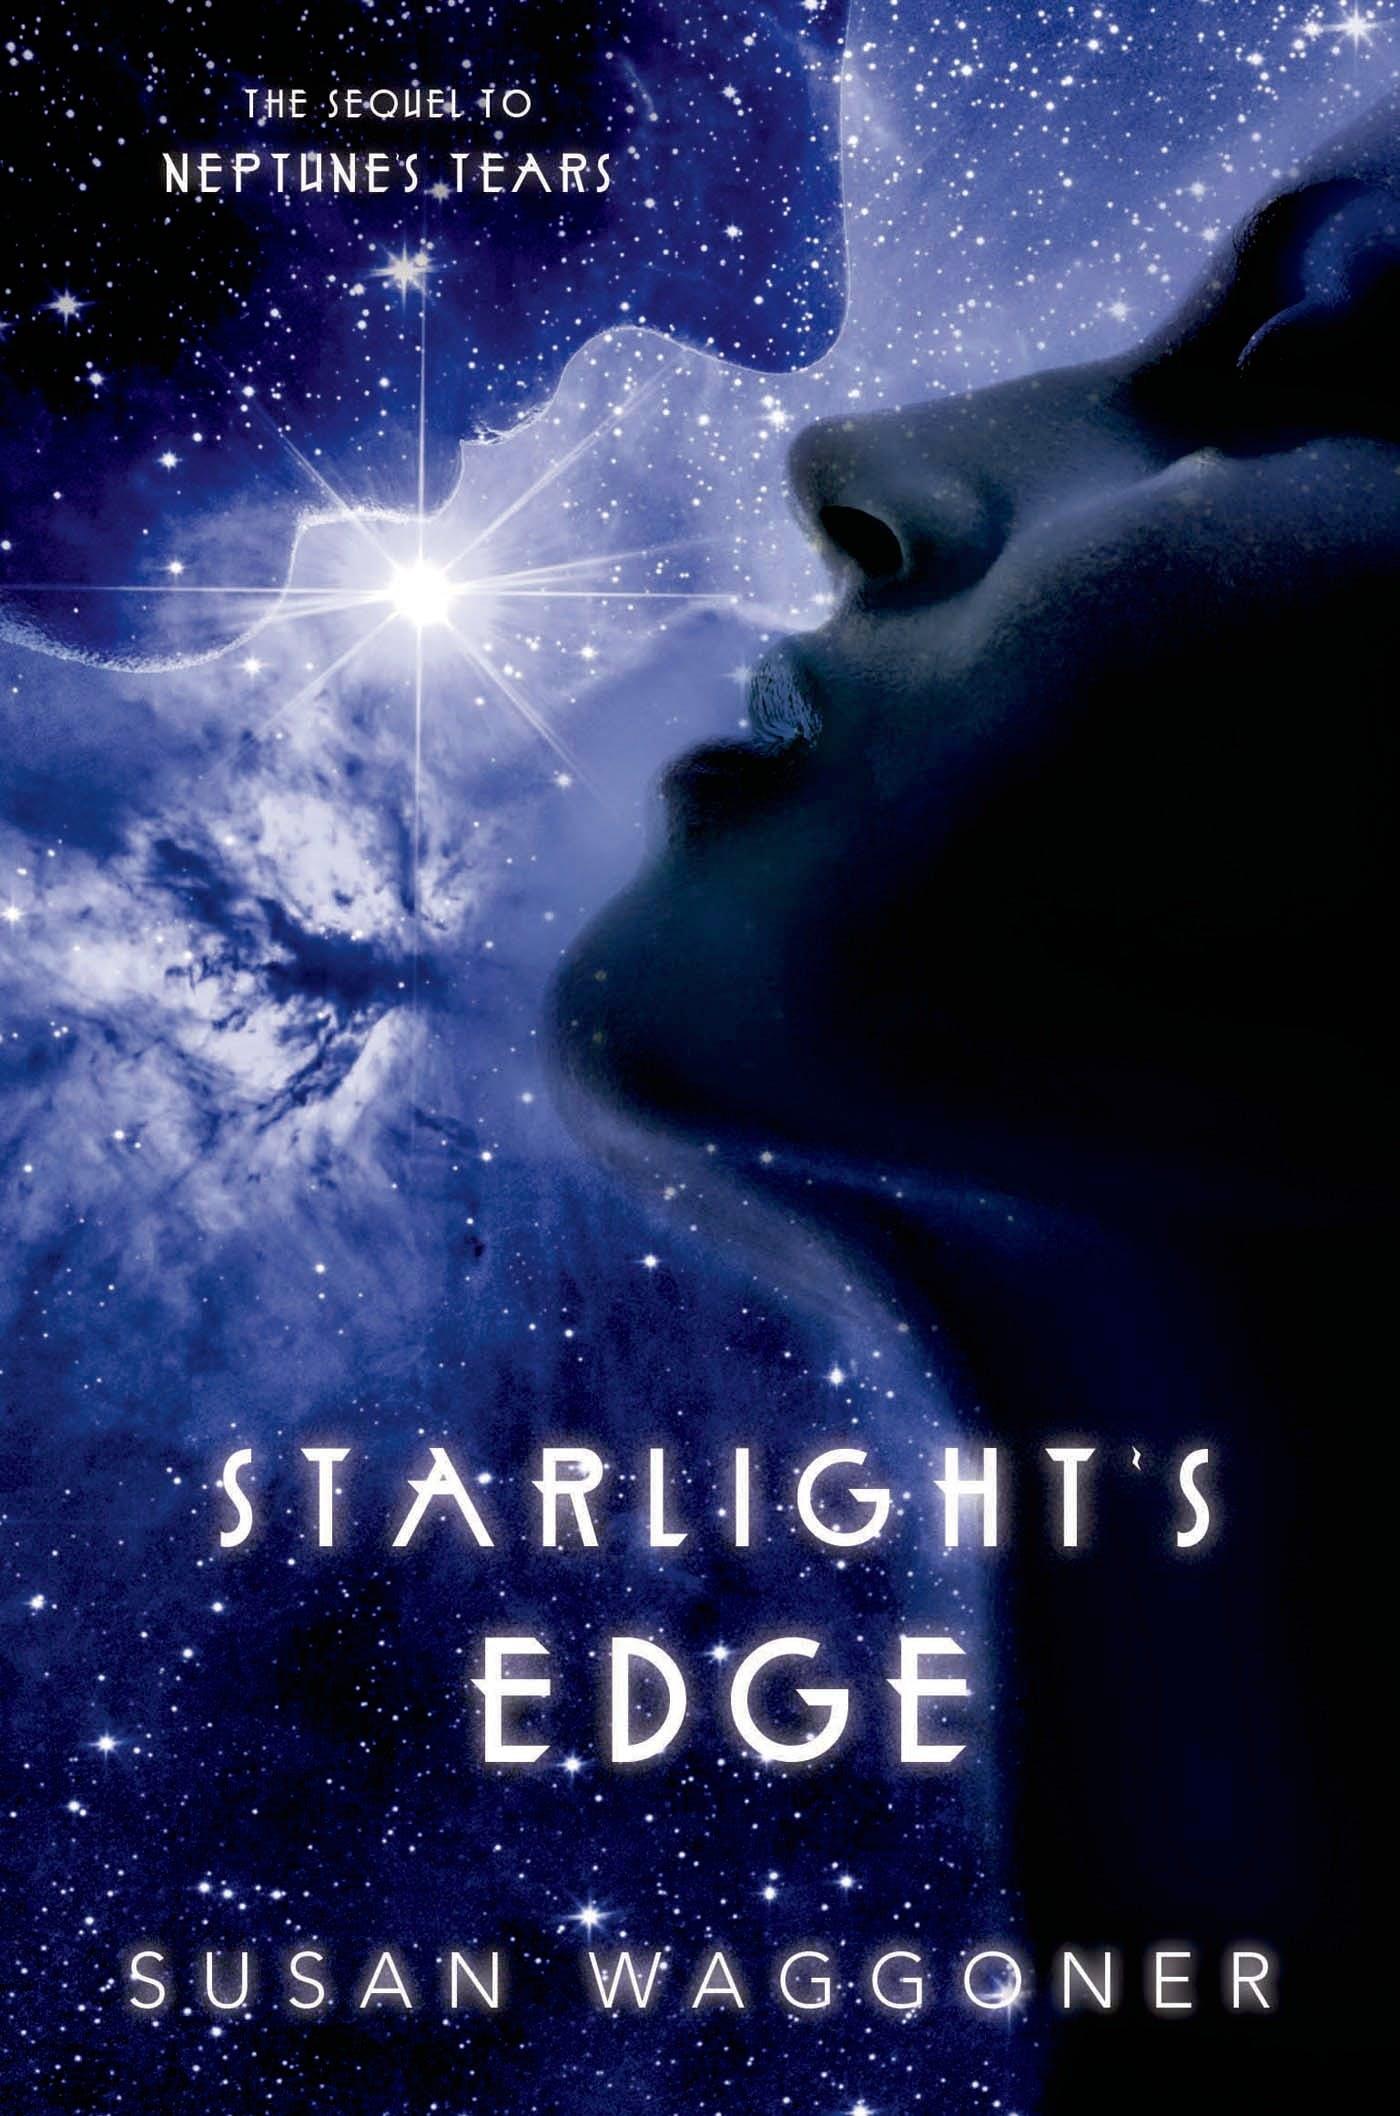 Image of Starlight's Edge